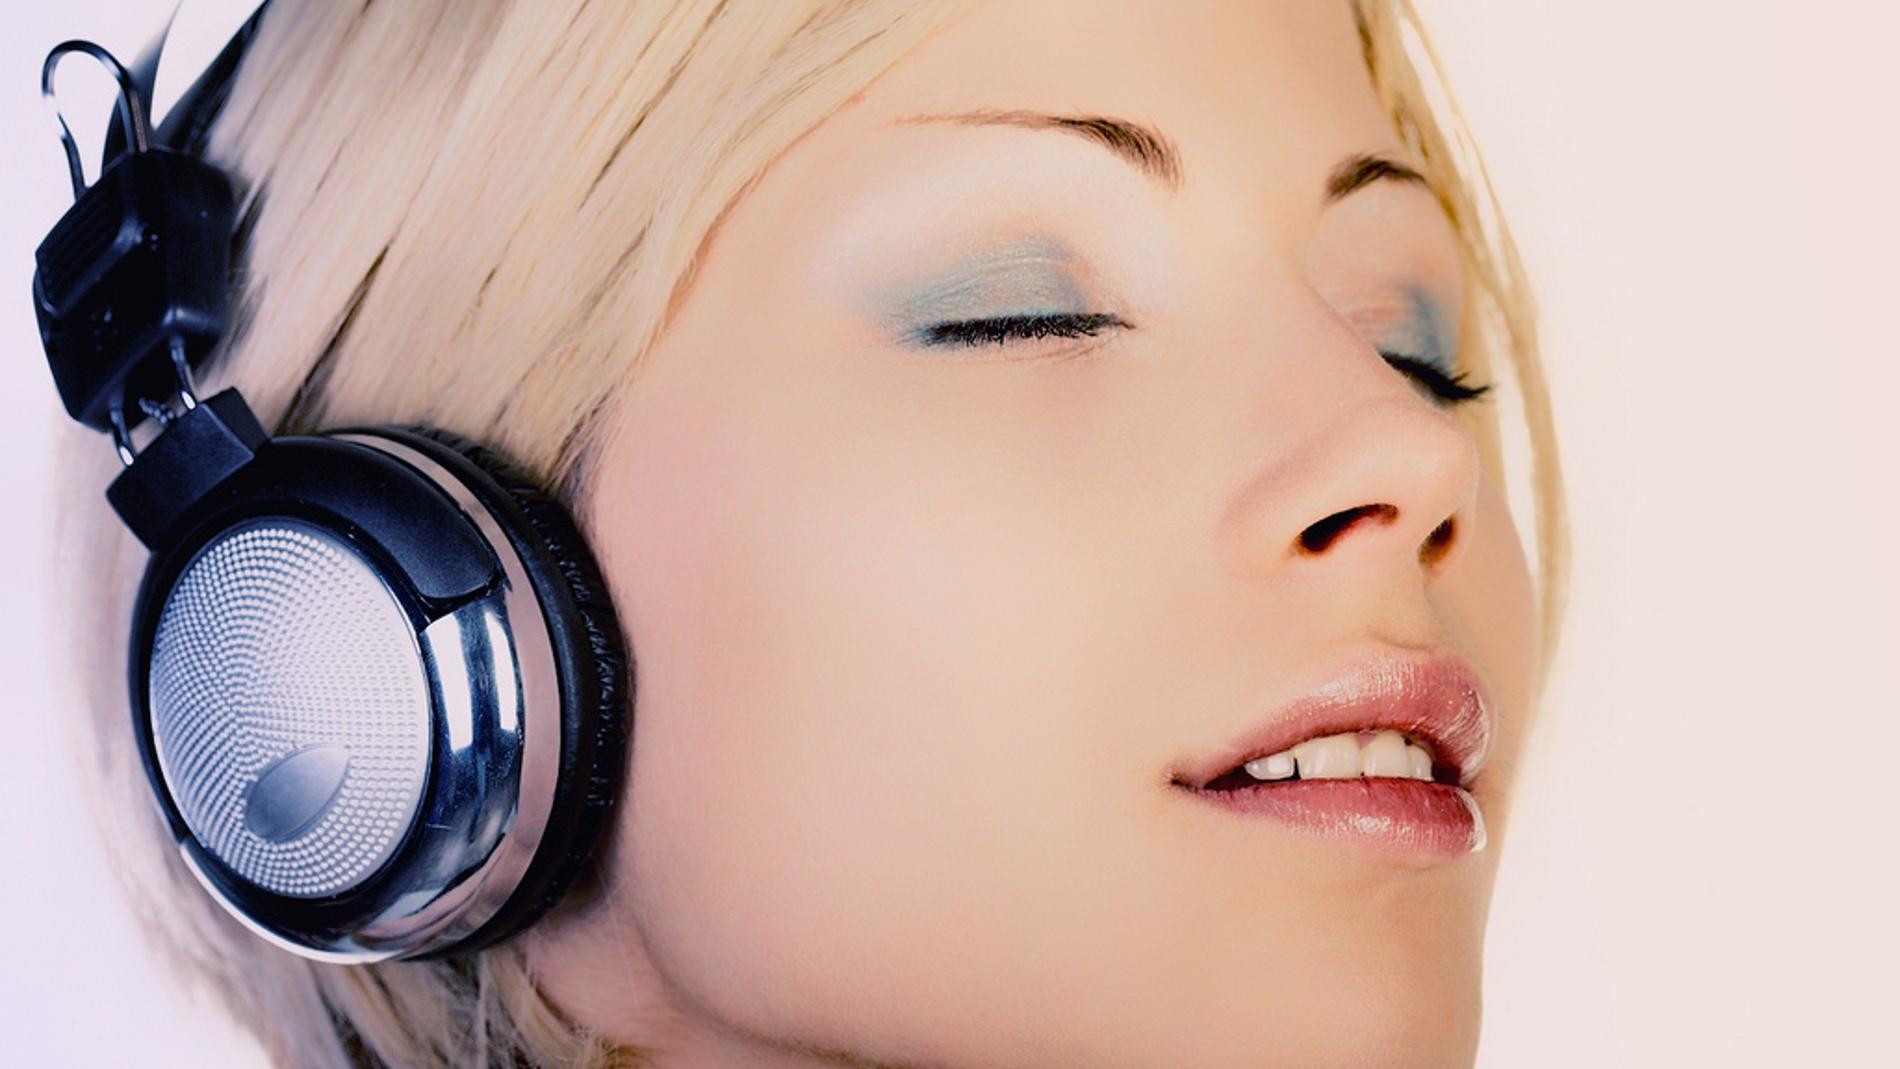 Escucha música gracias a las mates